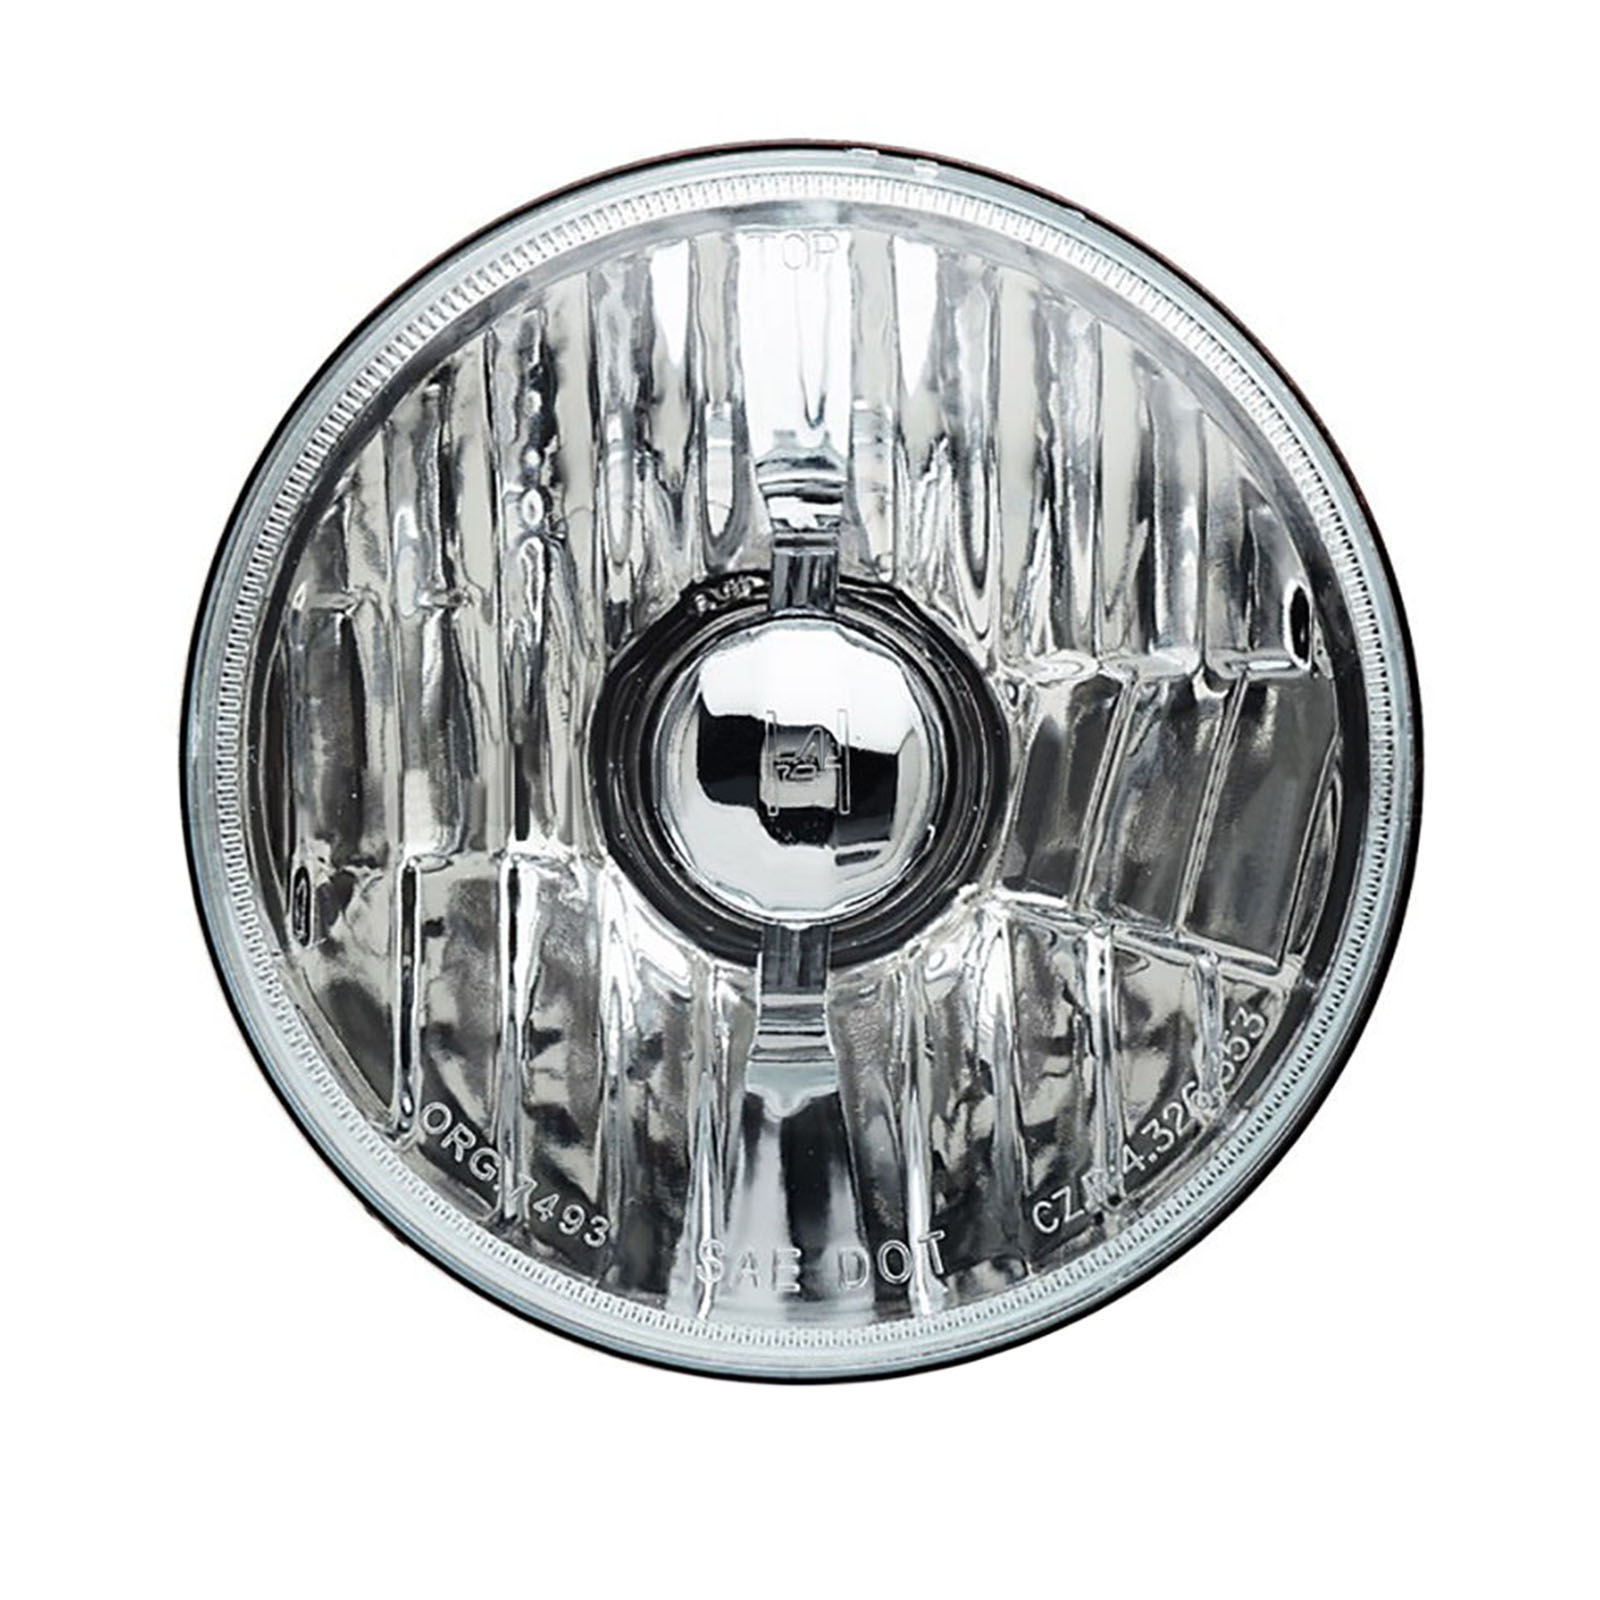 For GMC Sierra 1500 07-13 9005 H11 ice blue LED Headlight High Low Beam Bulbs